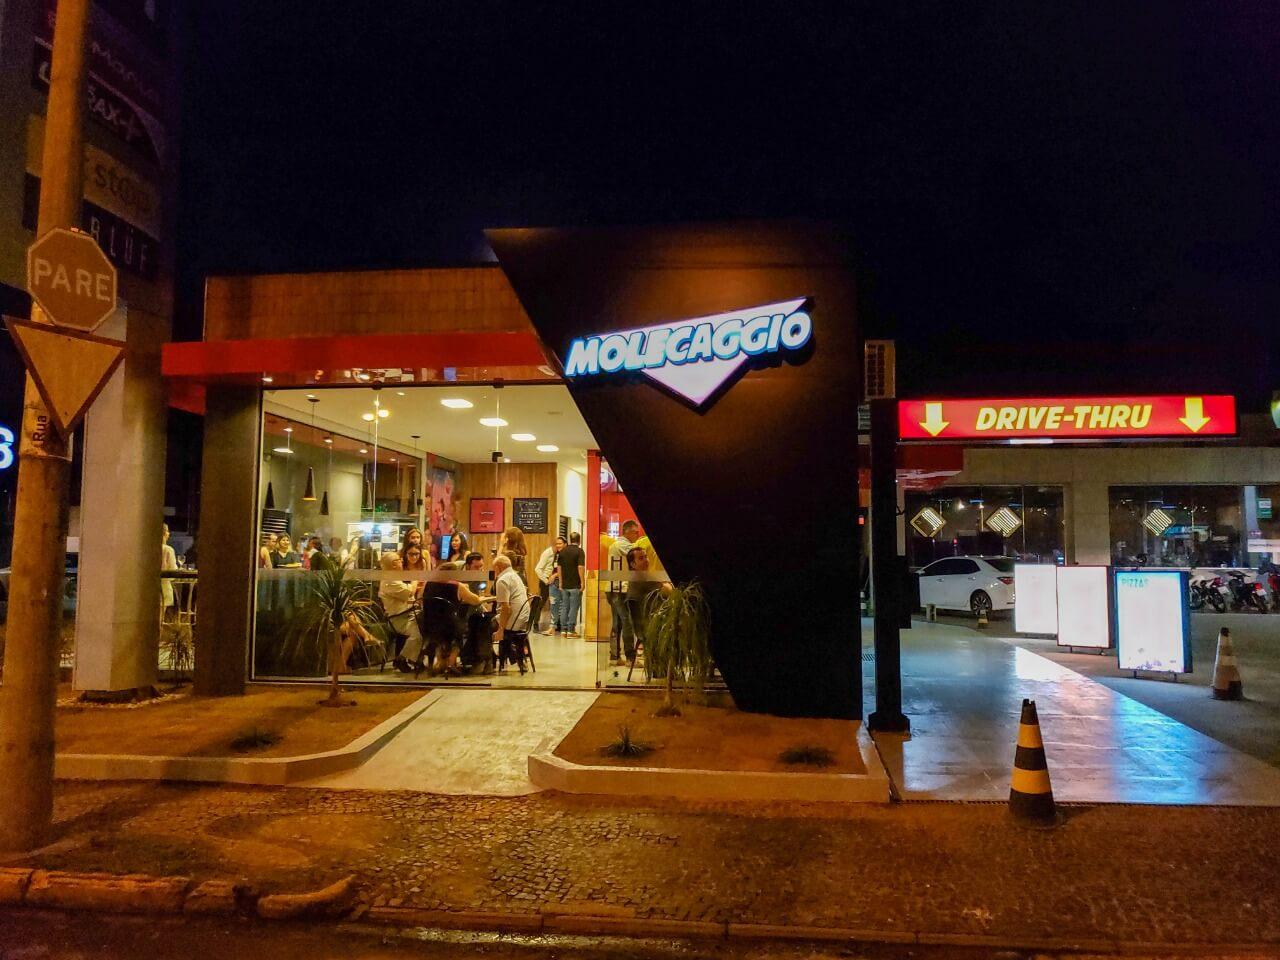 Pizzaria Molecaggio inaugura em Votuporanga